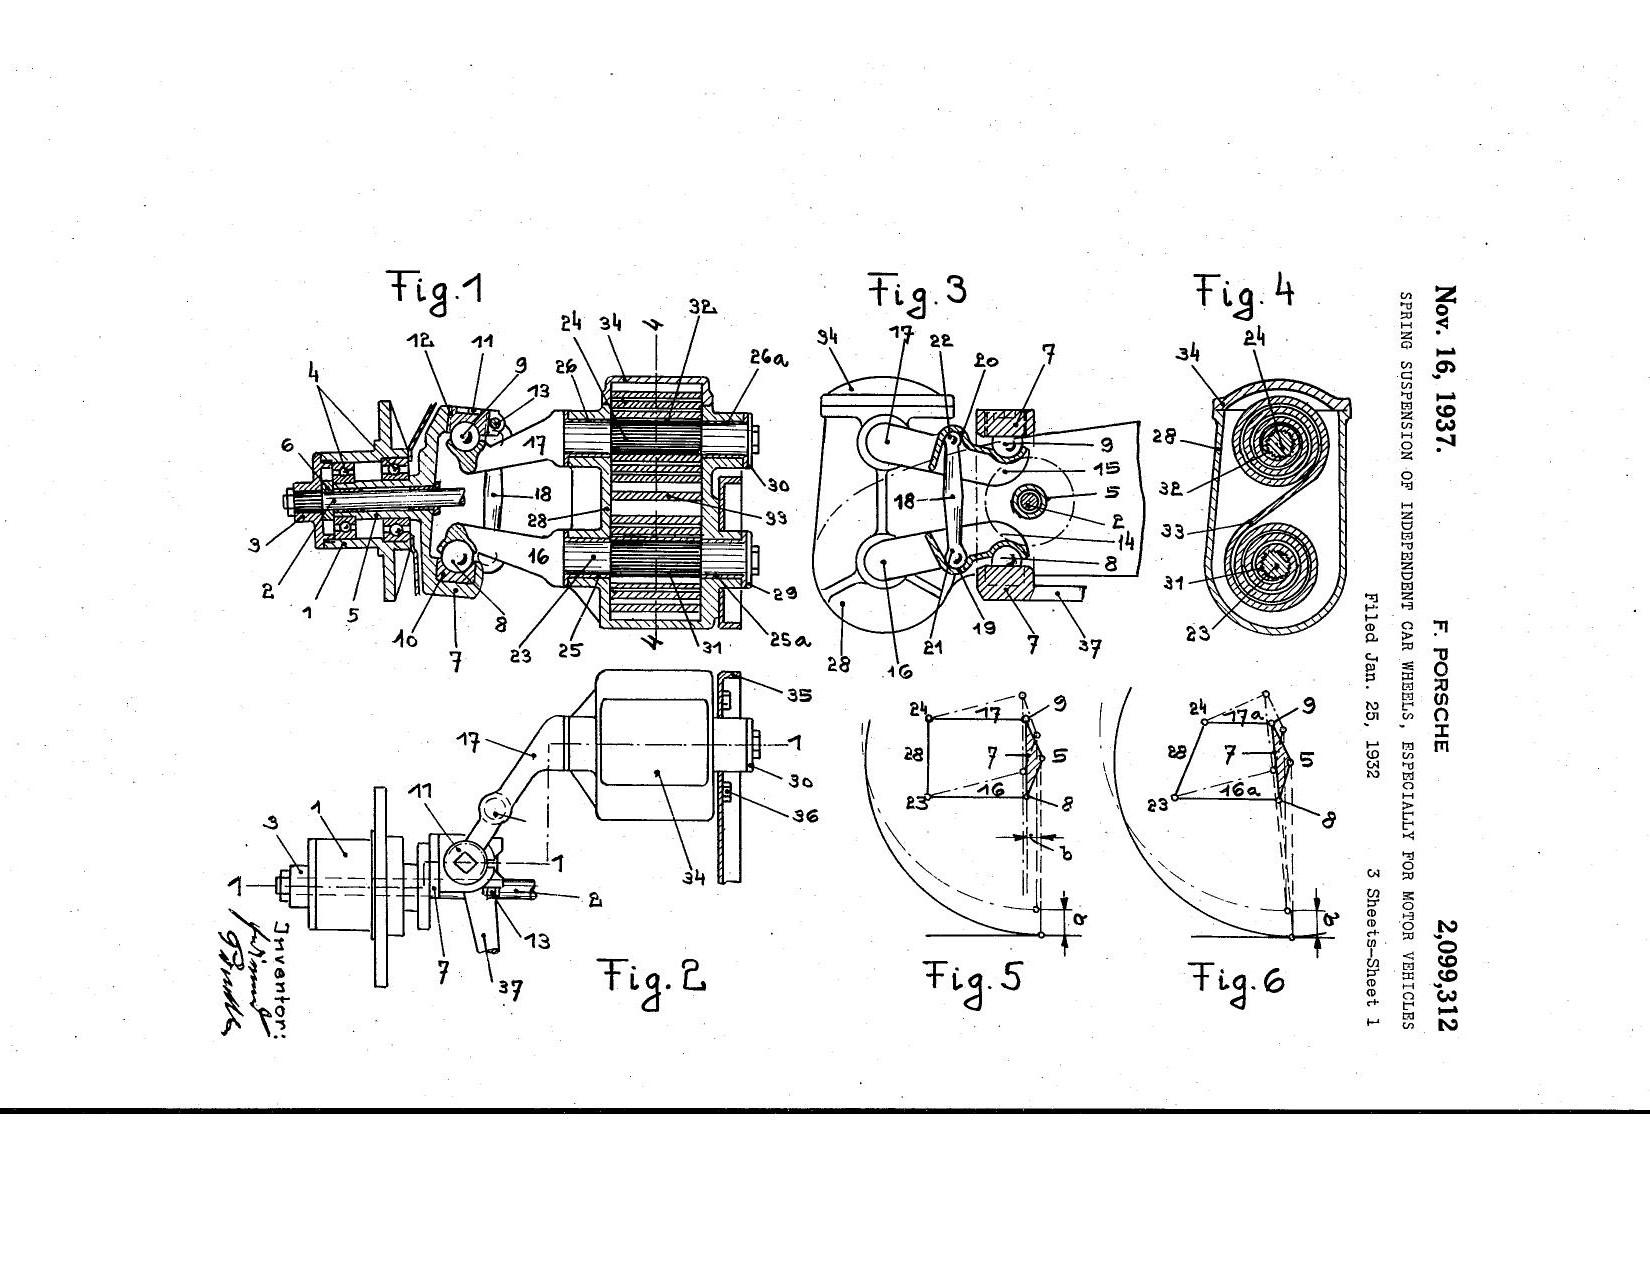 1948 mack truck wiring diagram  diagram  auto wiring diagram